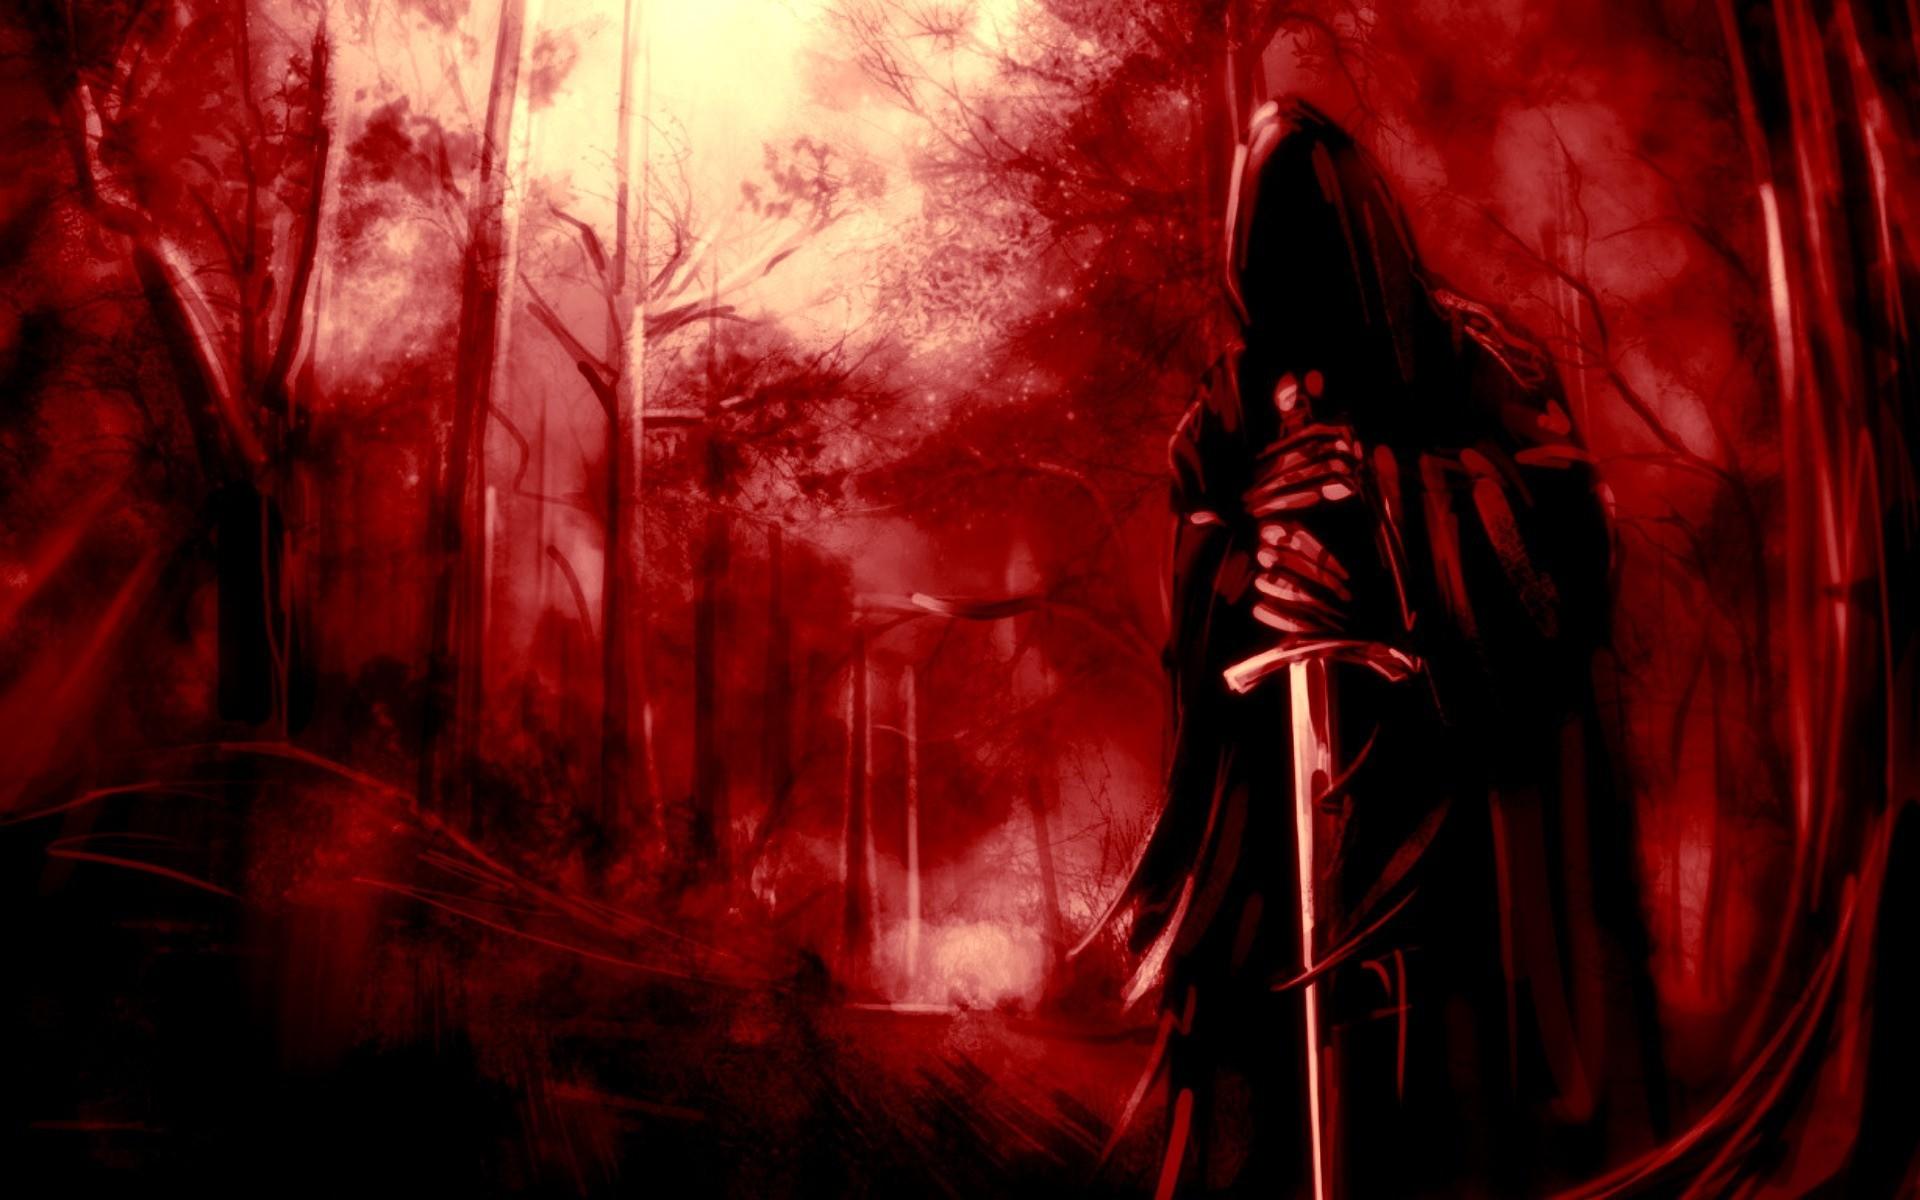 Dark Grim Reaper Horror Skeletons Skull Creepy Weapons Swords Trees Forest  Fantasy Wallpaper At Dark Wallpapers